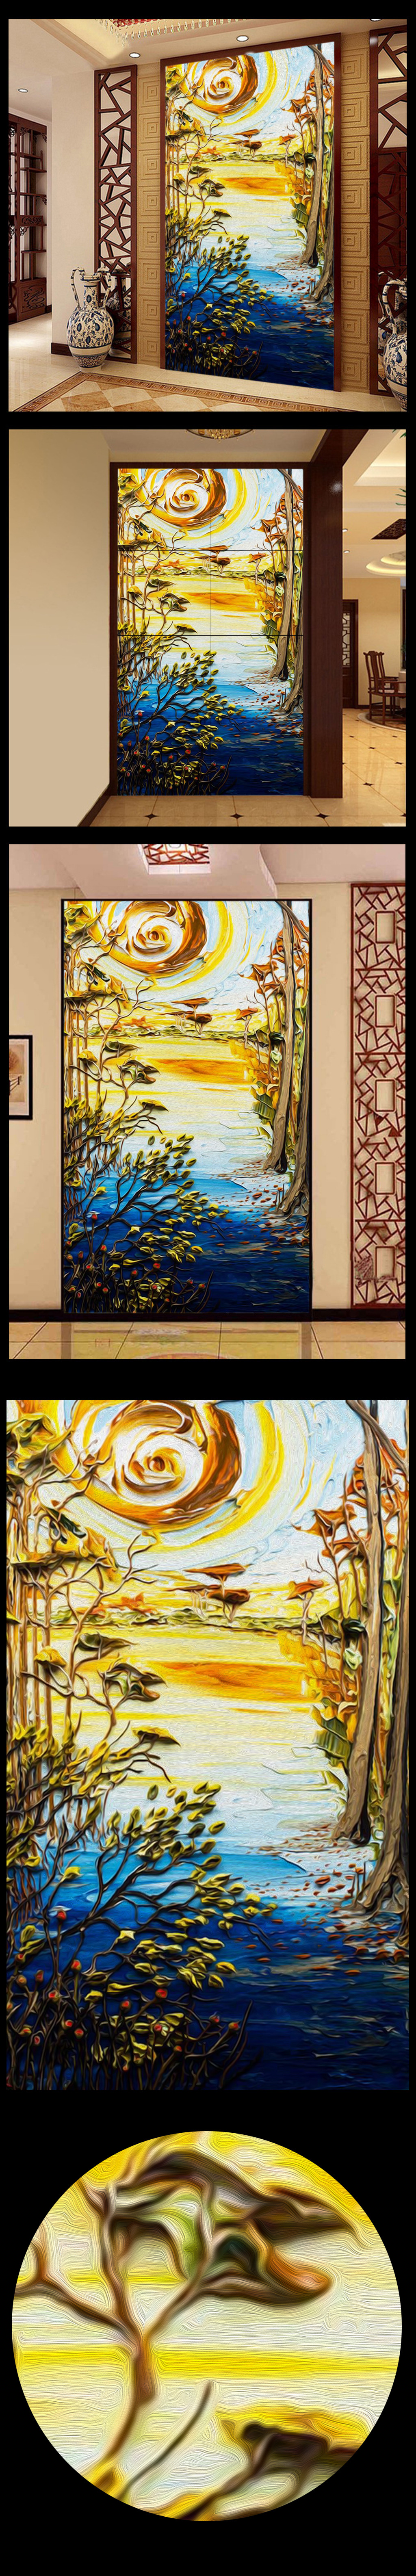 3d立体手绘油画风景墙画壁画玄关过道